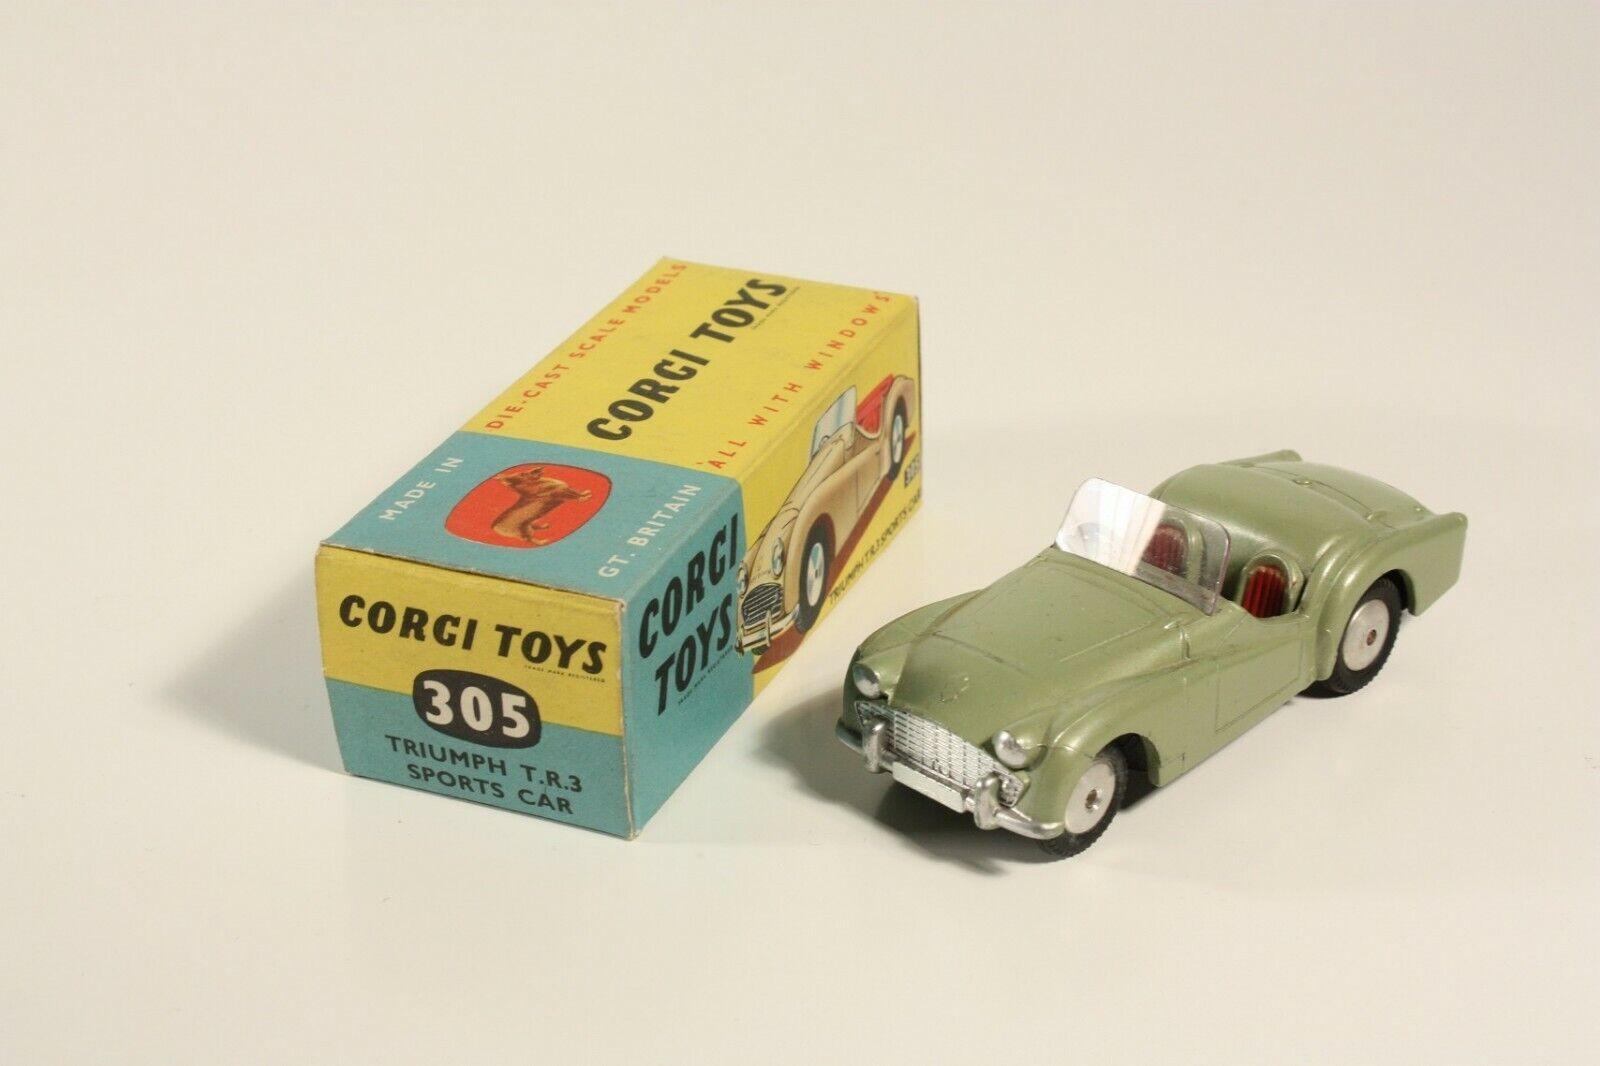 Corgi Toys 305 Triumph T.R. 3 Sports Car, Mint in Box  ab2290